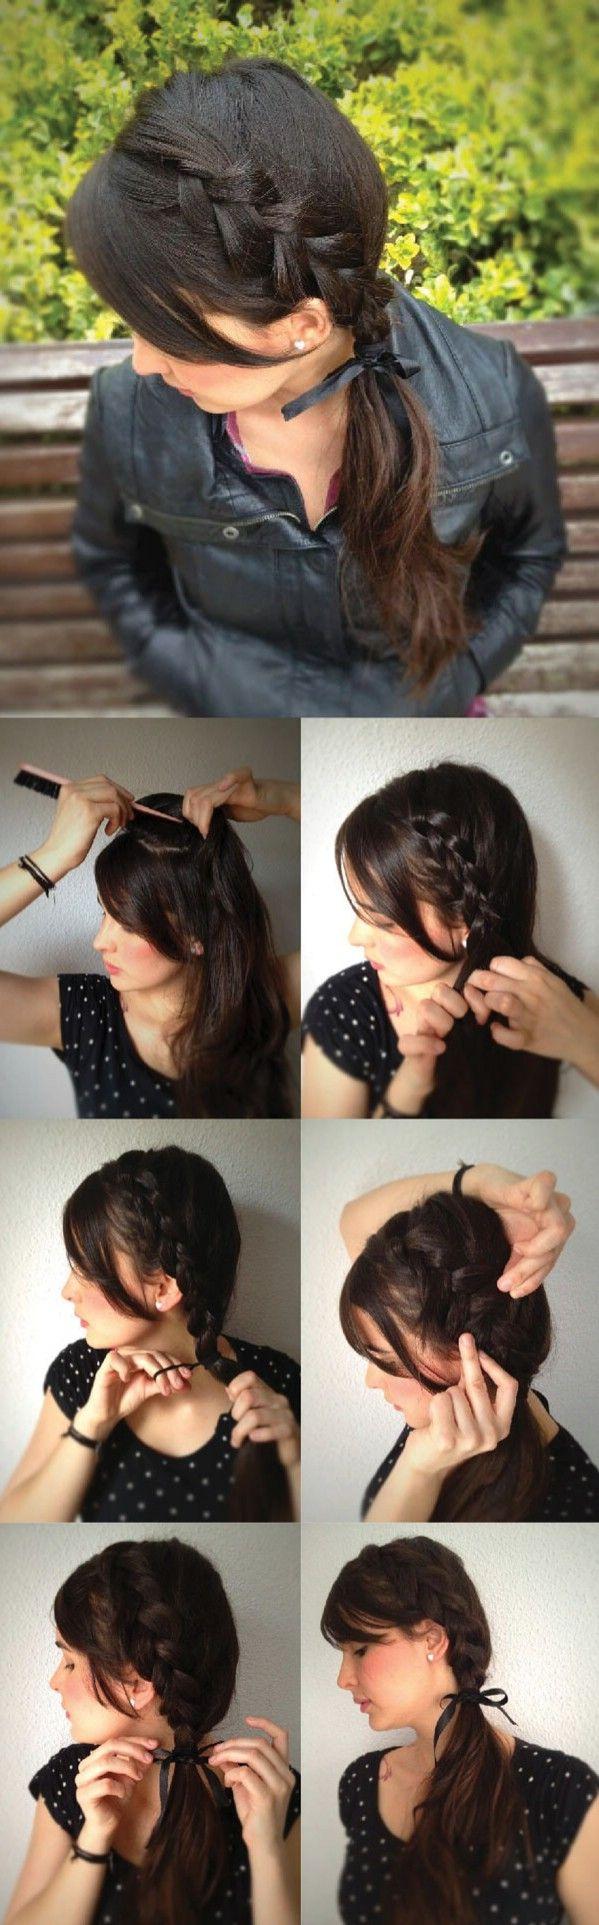 best hair images on pinterest undercut styles hair cut and